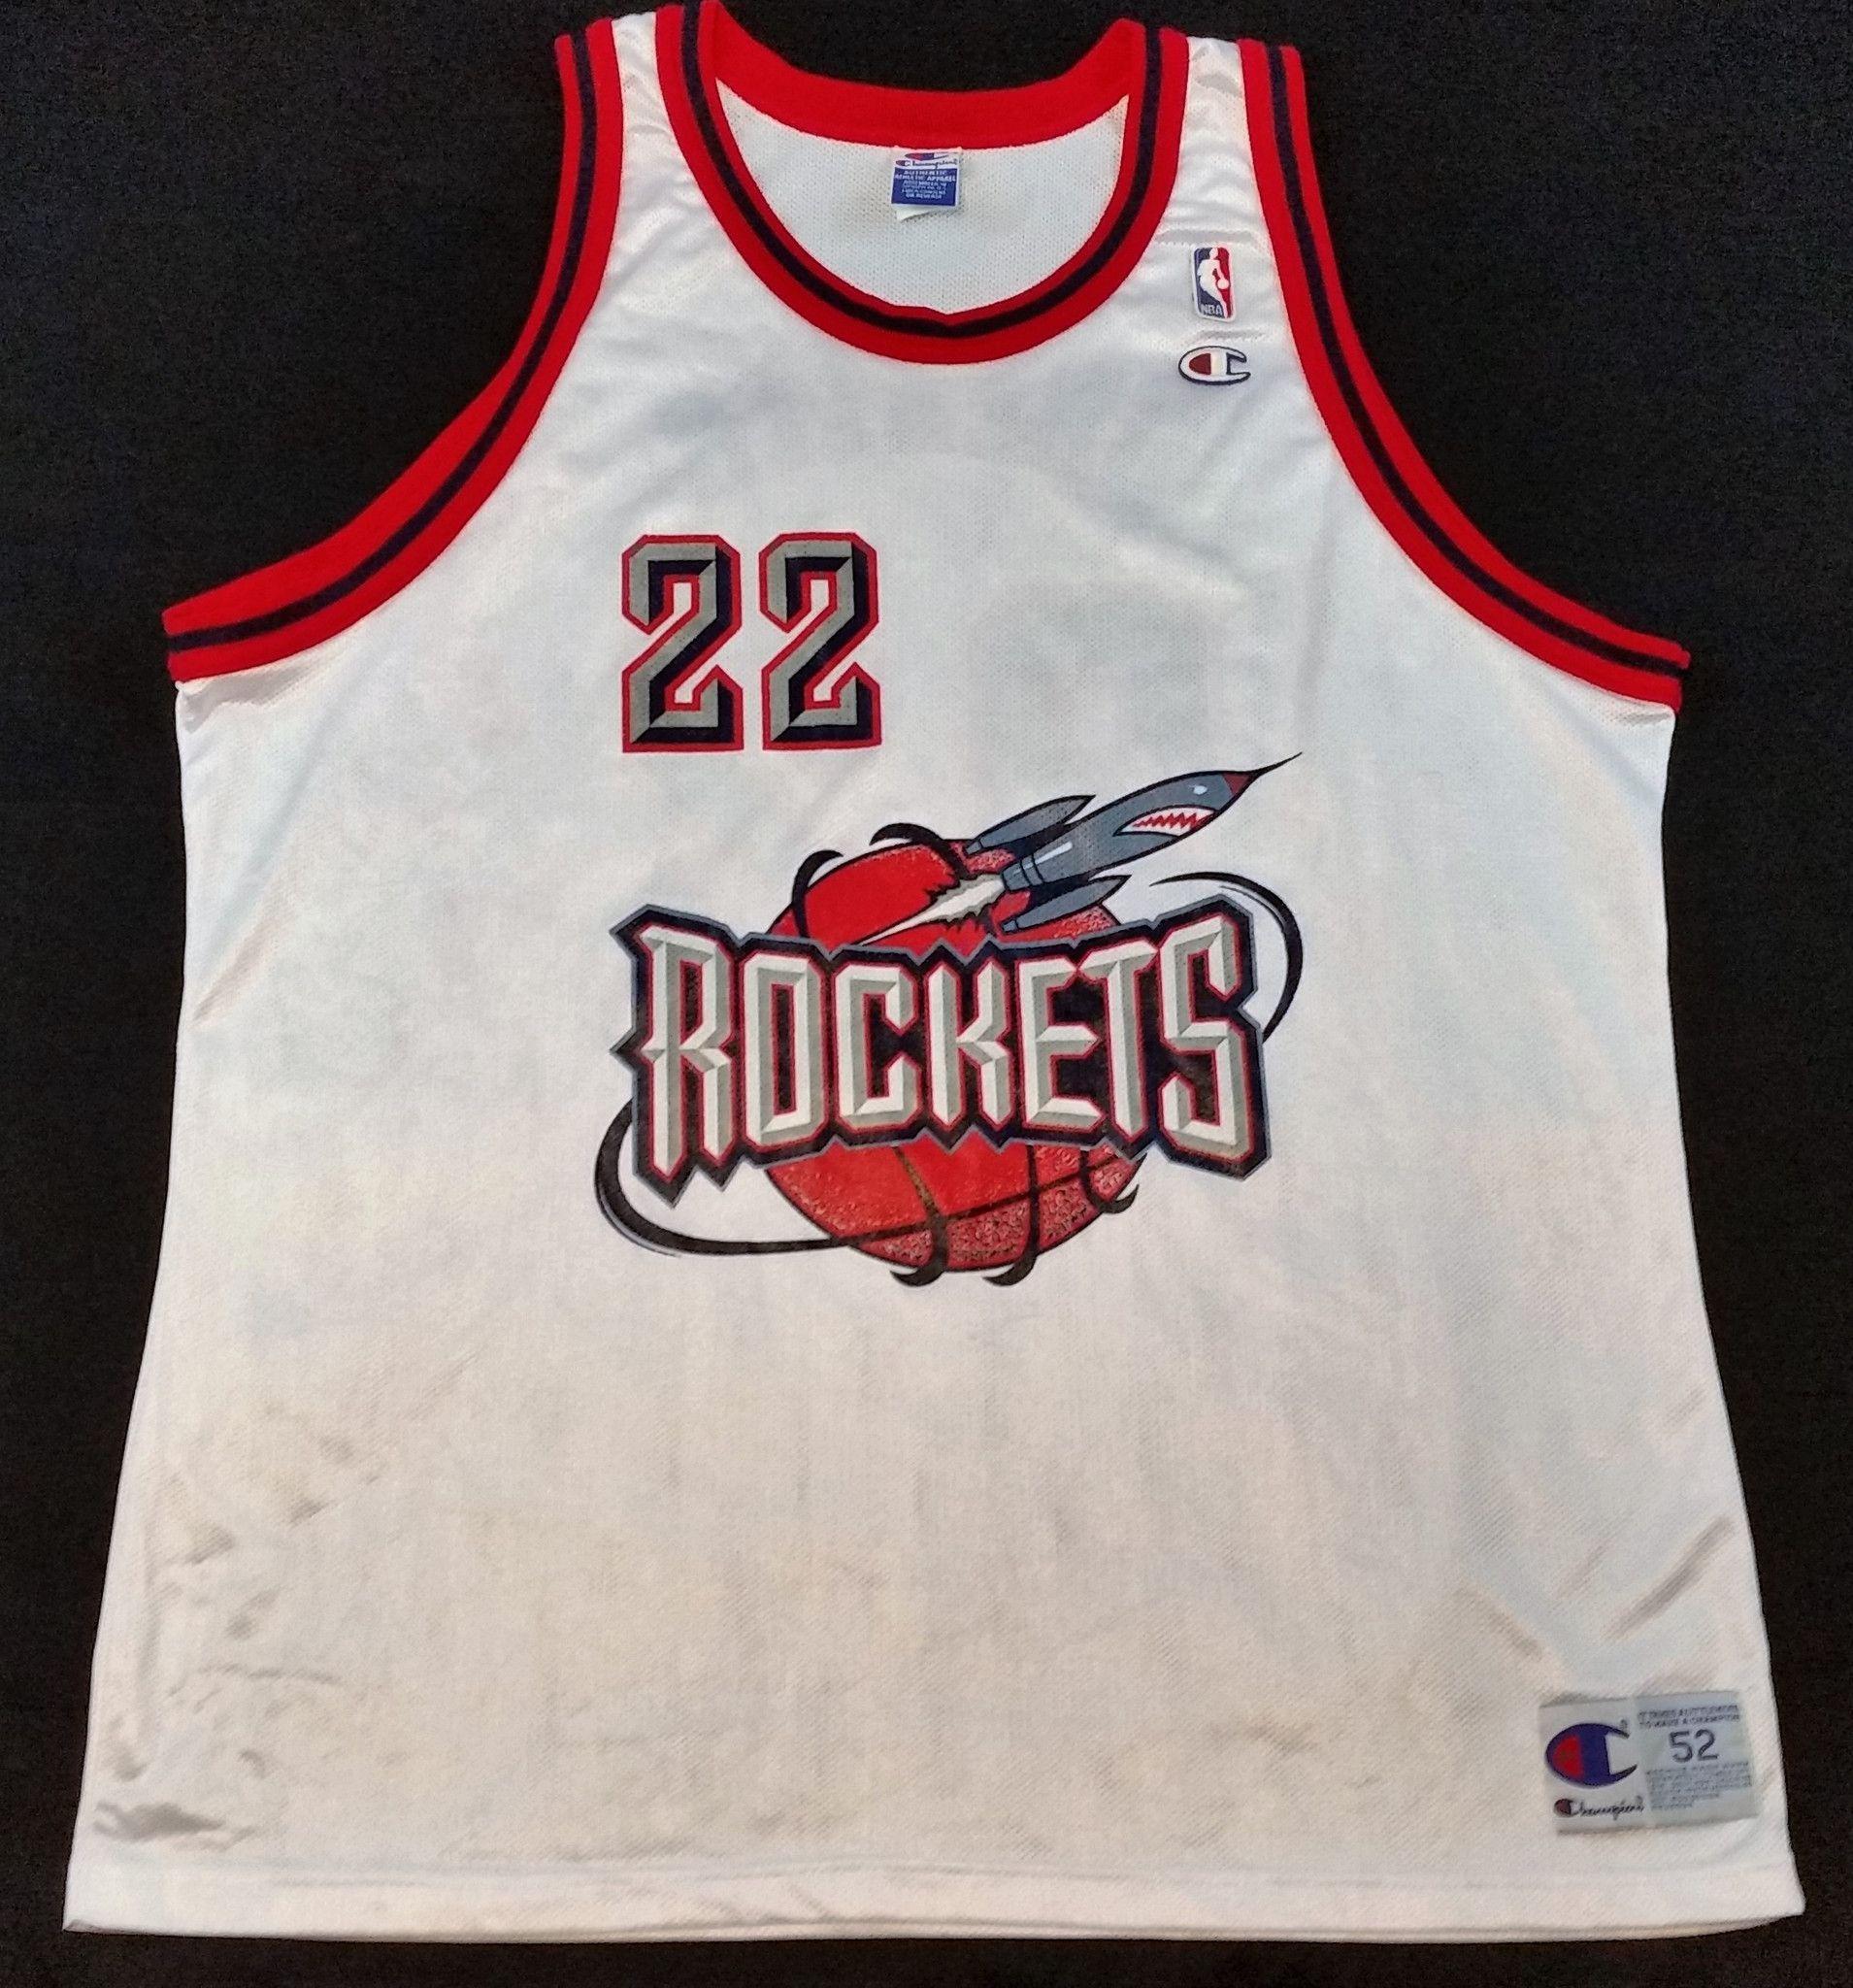 48956f3a7 Clyde Drexler Vintage Champion Jersey Houston Rockets NBA Rare Alternate  Mens 52